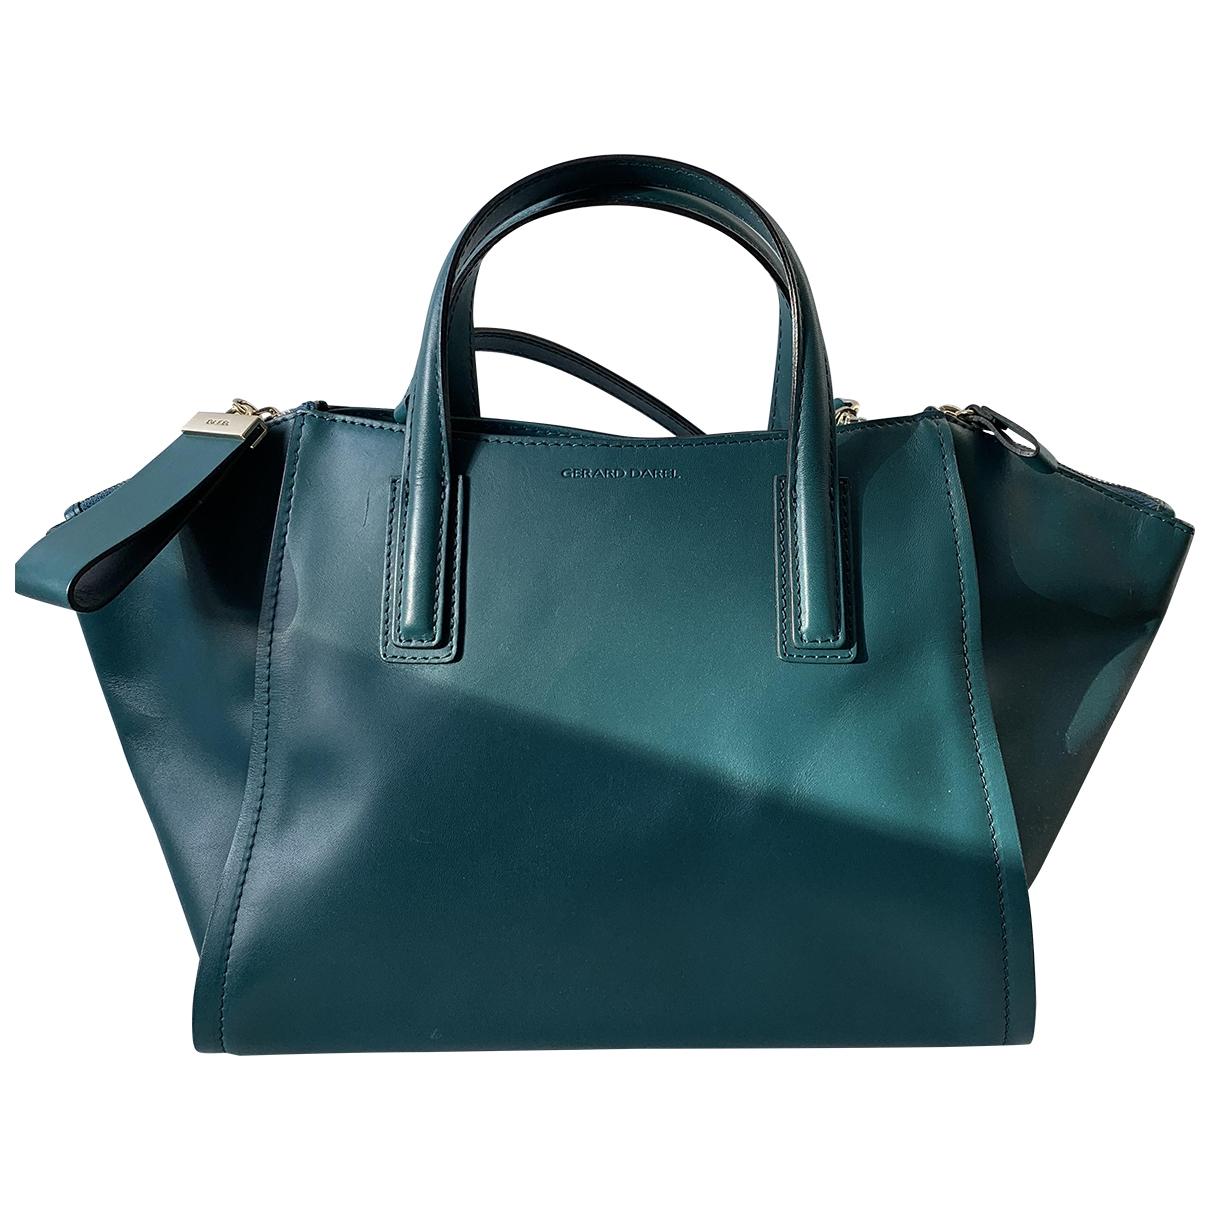 Gerard Darel - Sac a main   pour femme en cuir - turquoise